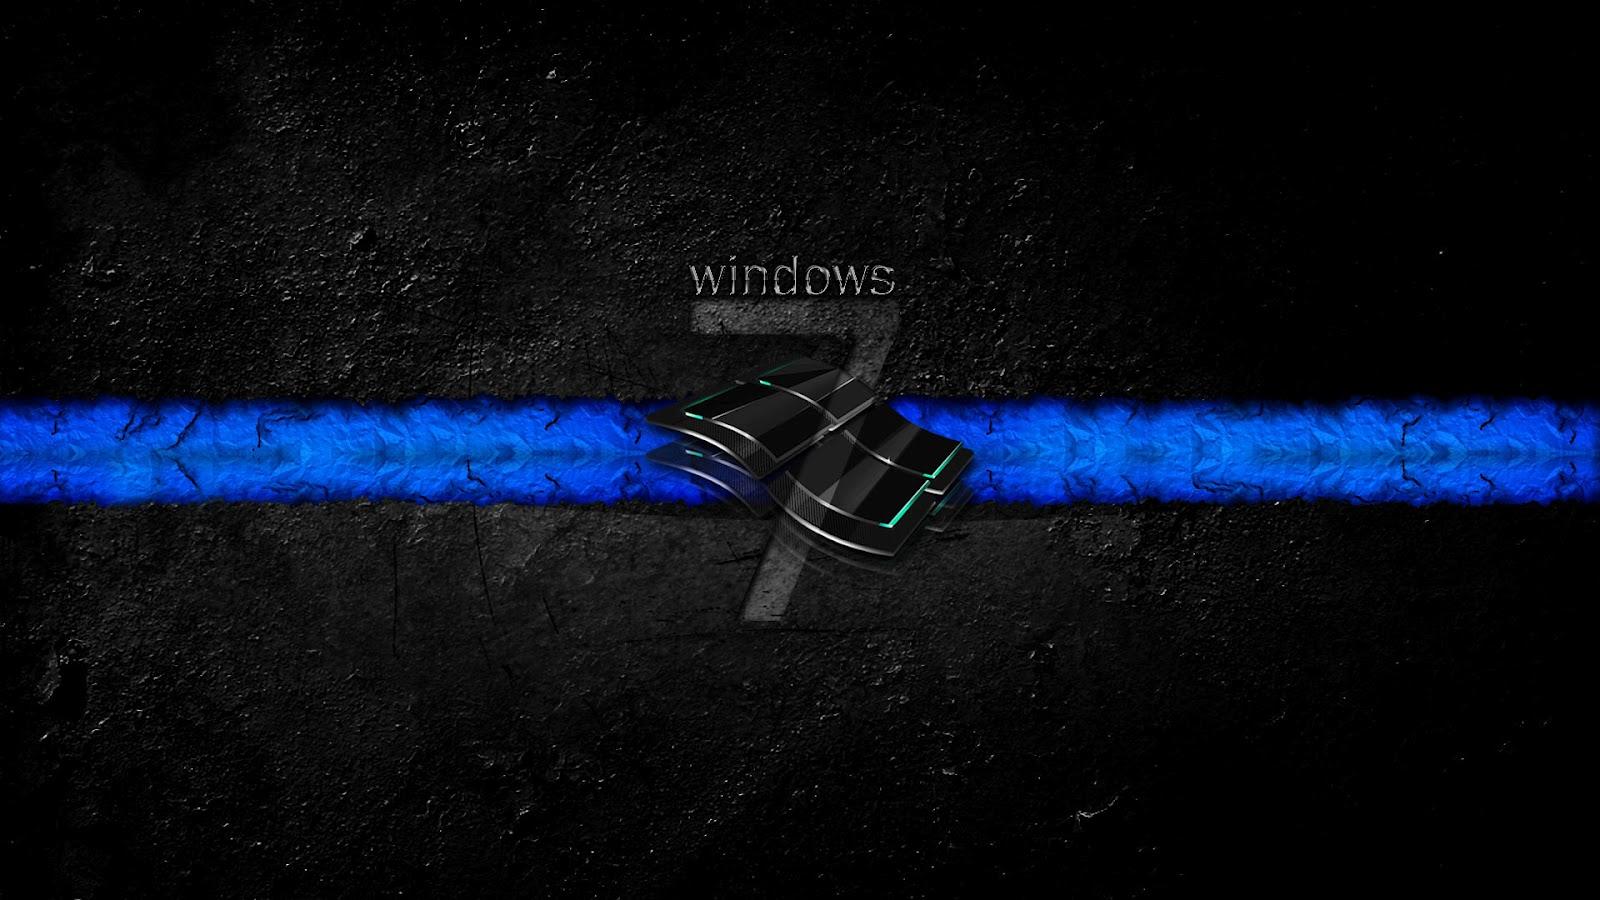 http://2.bp.blogspot.com/-wfW30ARcOzU/UNhJKmBdn8I/AAAAAAAAM7M/M6GVMWON_Gk/s1600/windows_7_HD_HQ.jpg